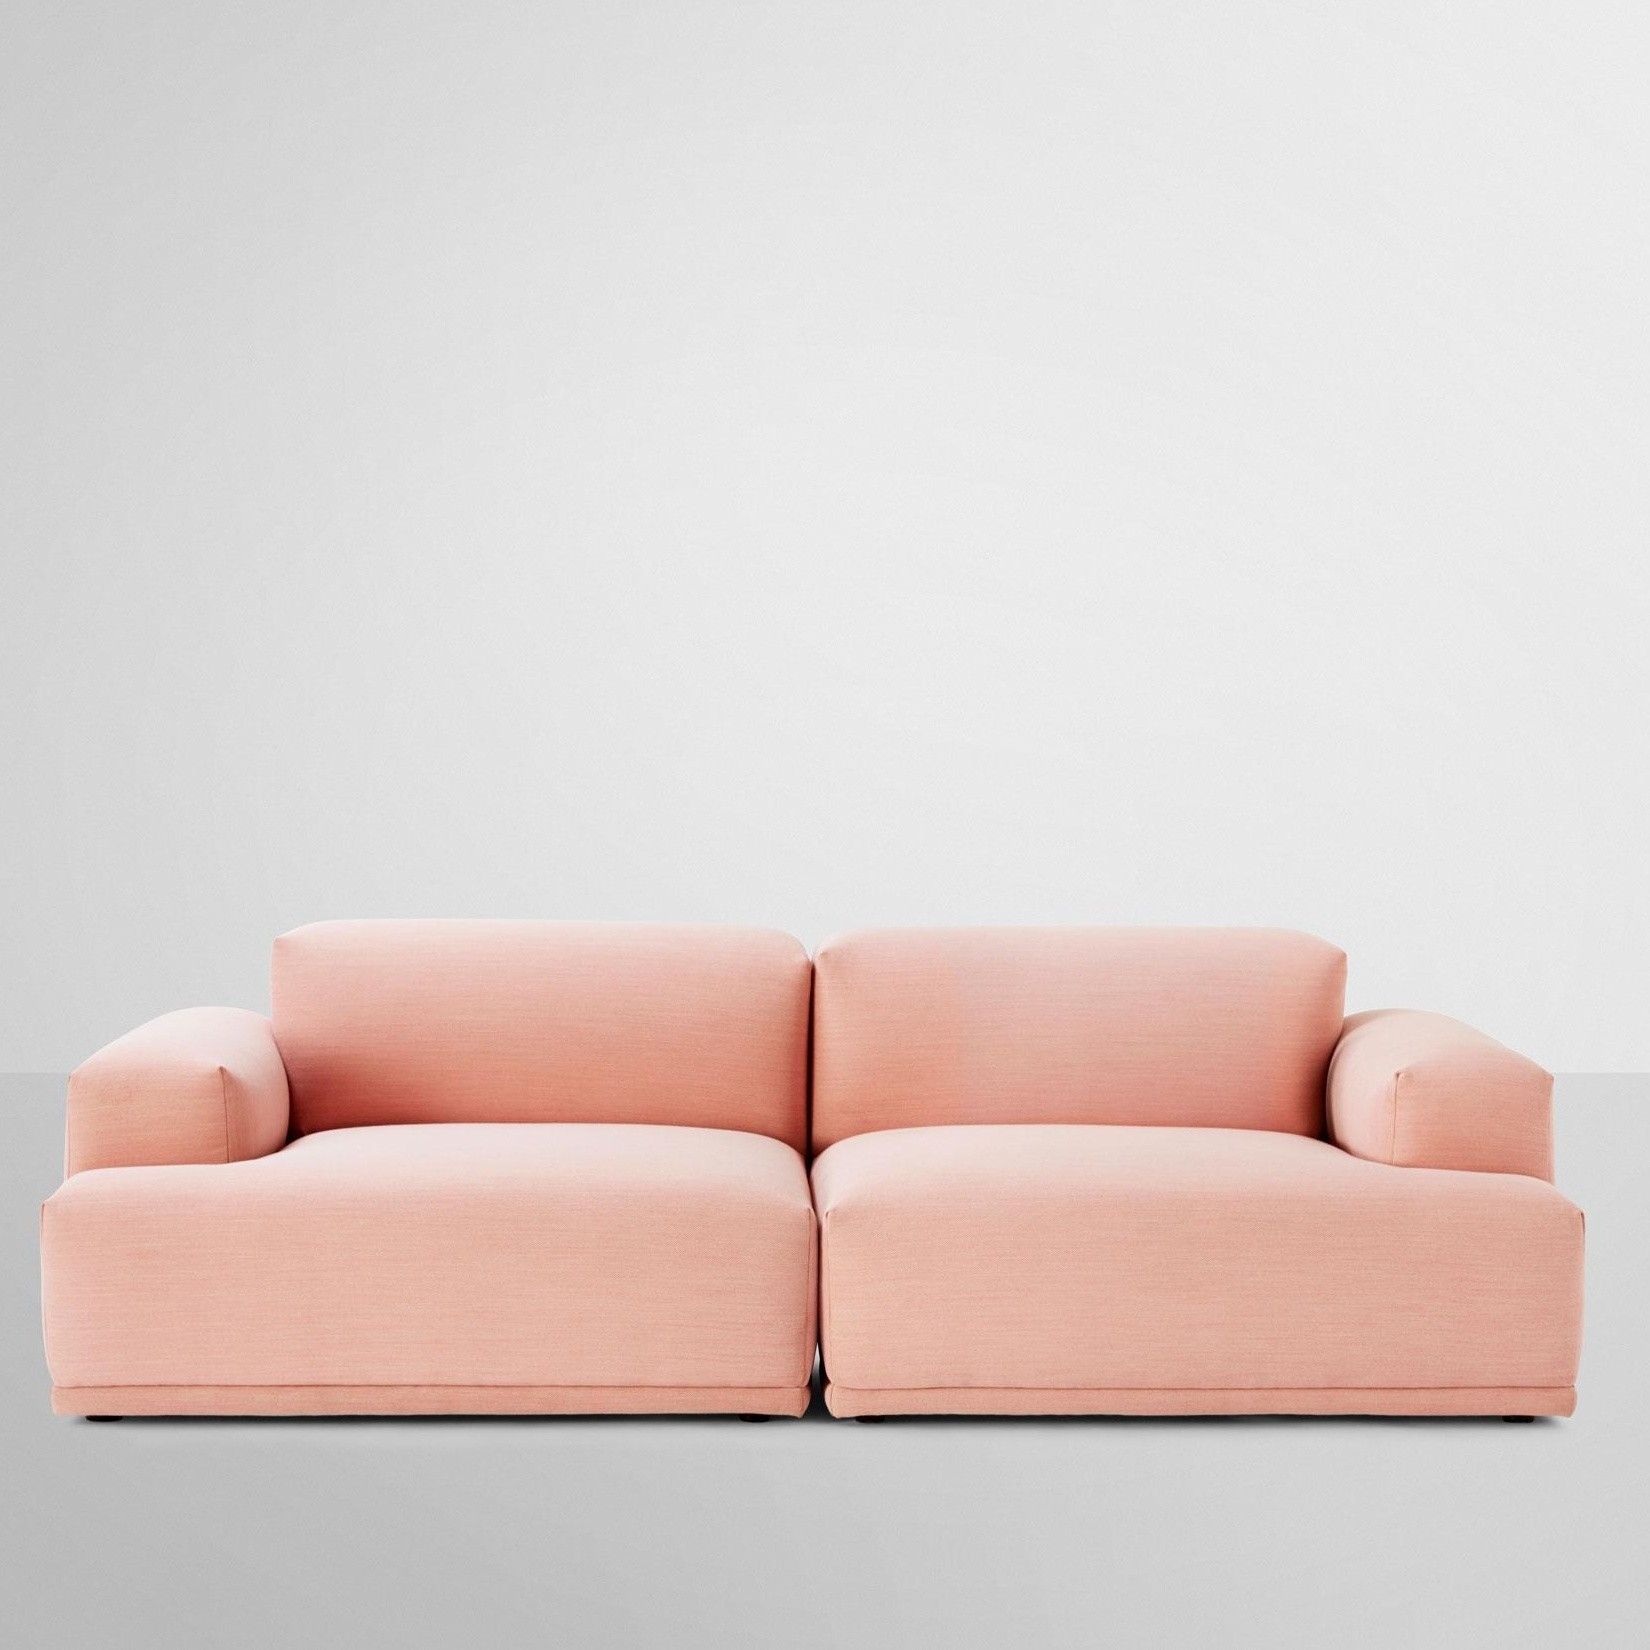 muuto connect lounge 2 sitzer sofa ambientedirect. Black Bedroom Furniture Sets. Home Design Ideas